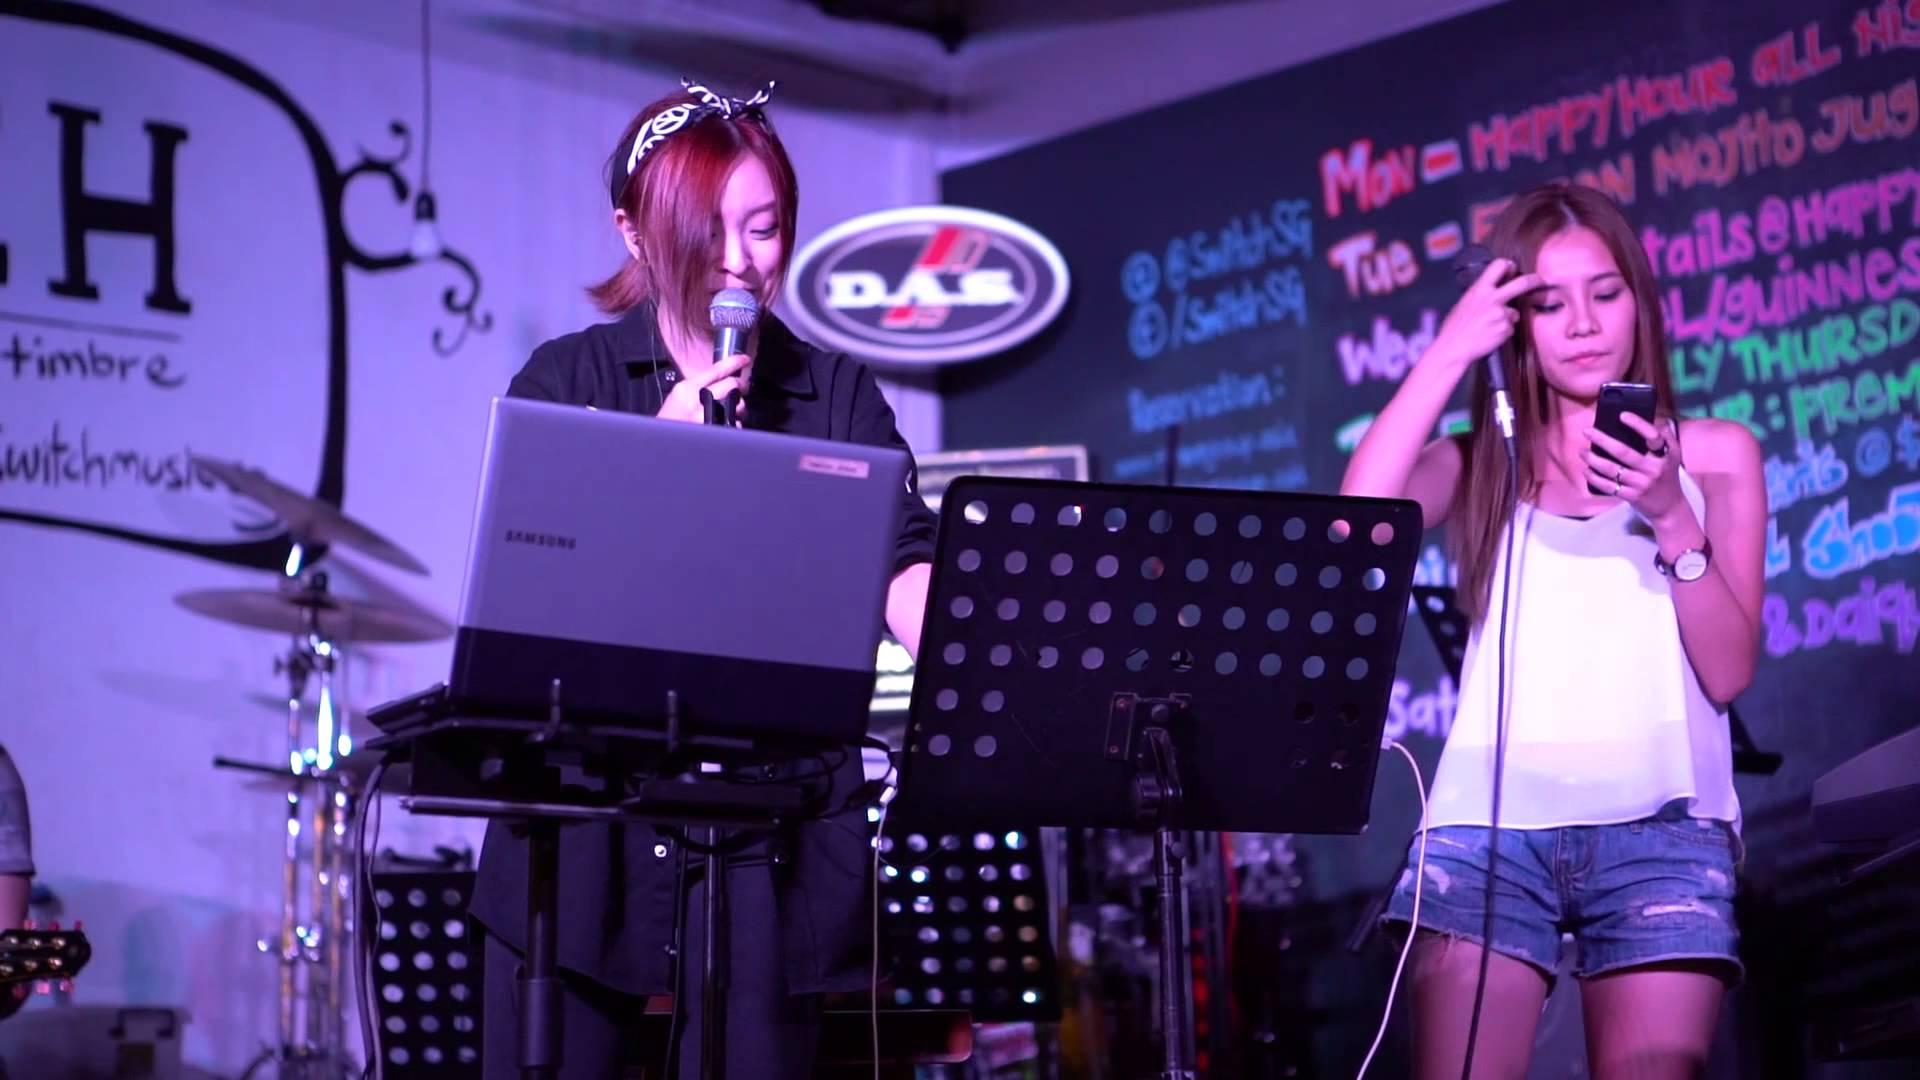 Hummingbird Vocalist - Cherelle Tan 2